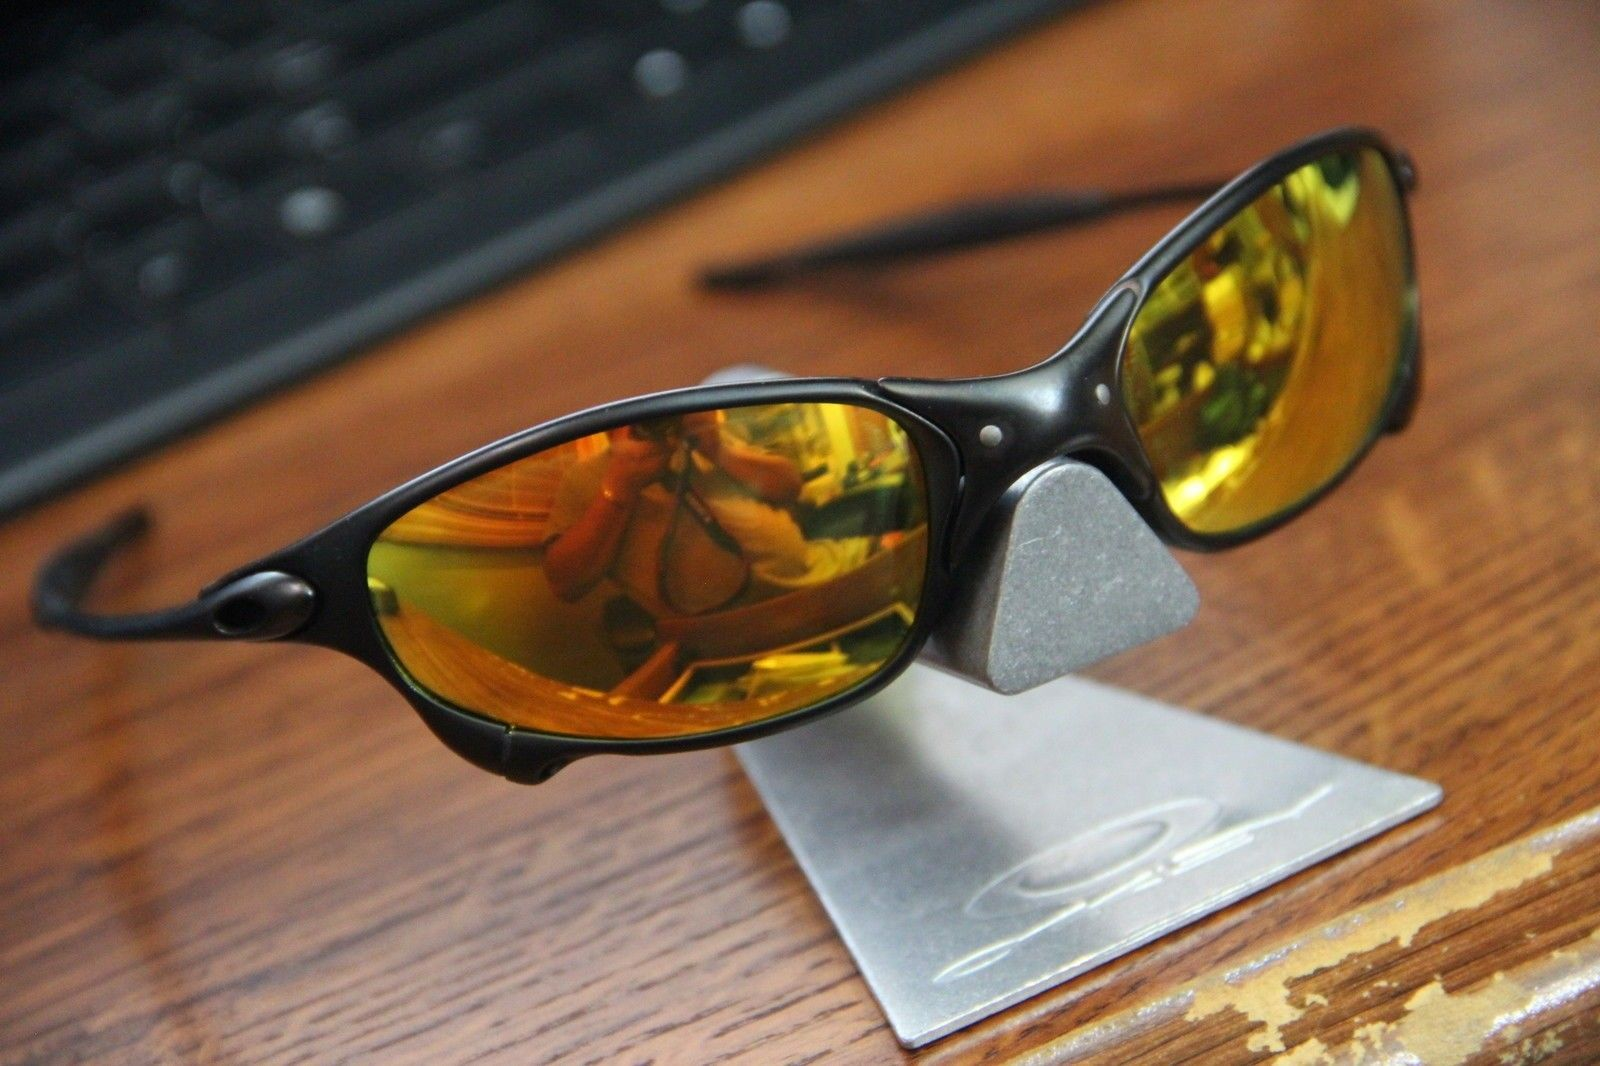 Oakley Juliet Fire Iridium: Choosing Frame - $(KGrHqF,!p8FIMs!+y+lBSGBg4MWfw~~60_57.JPG